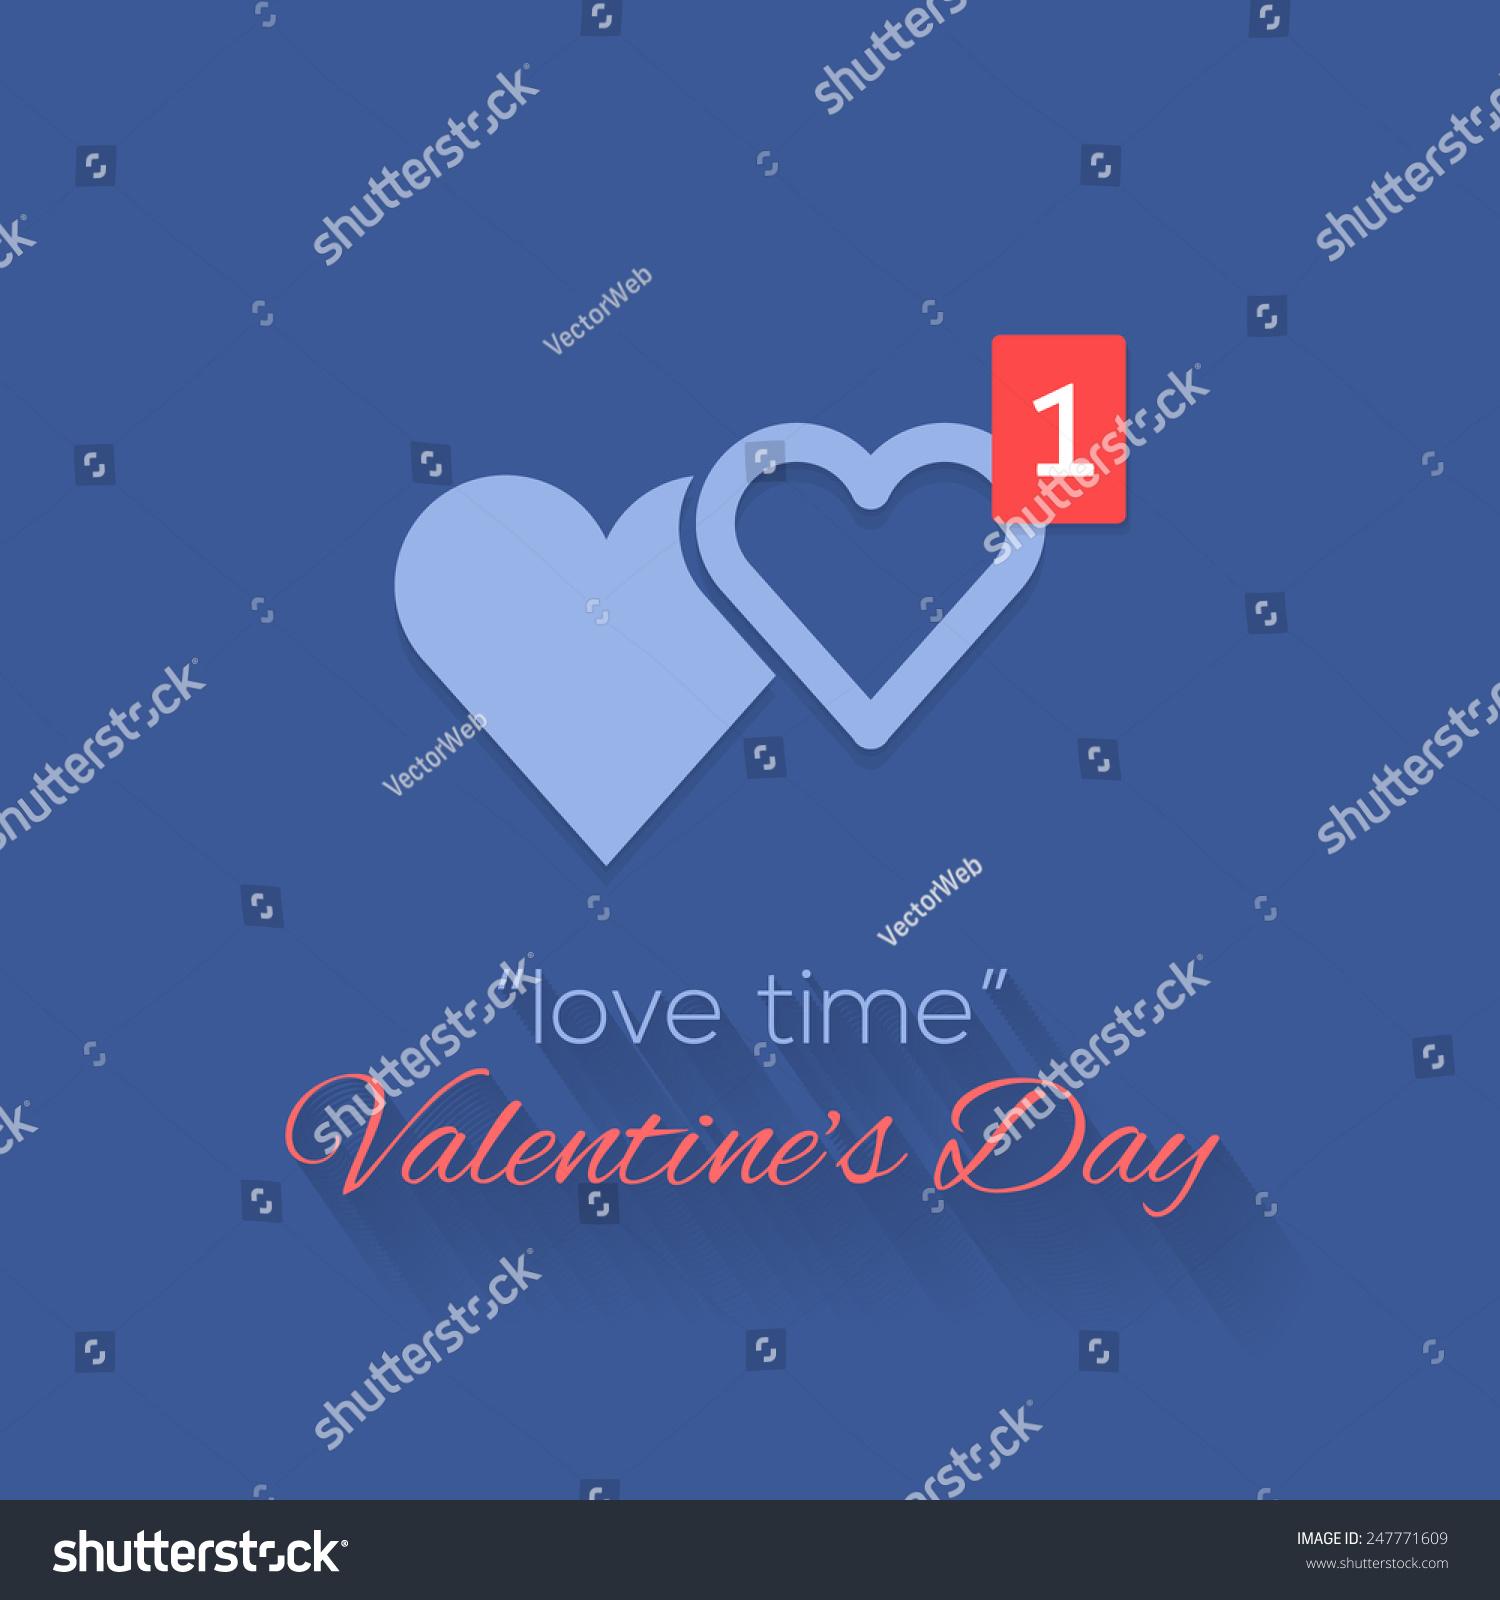 Couple heart symbols love time concept stock vector 247771609 couple heart symbols and love time concept valentines day background design 1 hearts symbol biocorpaavc